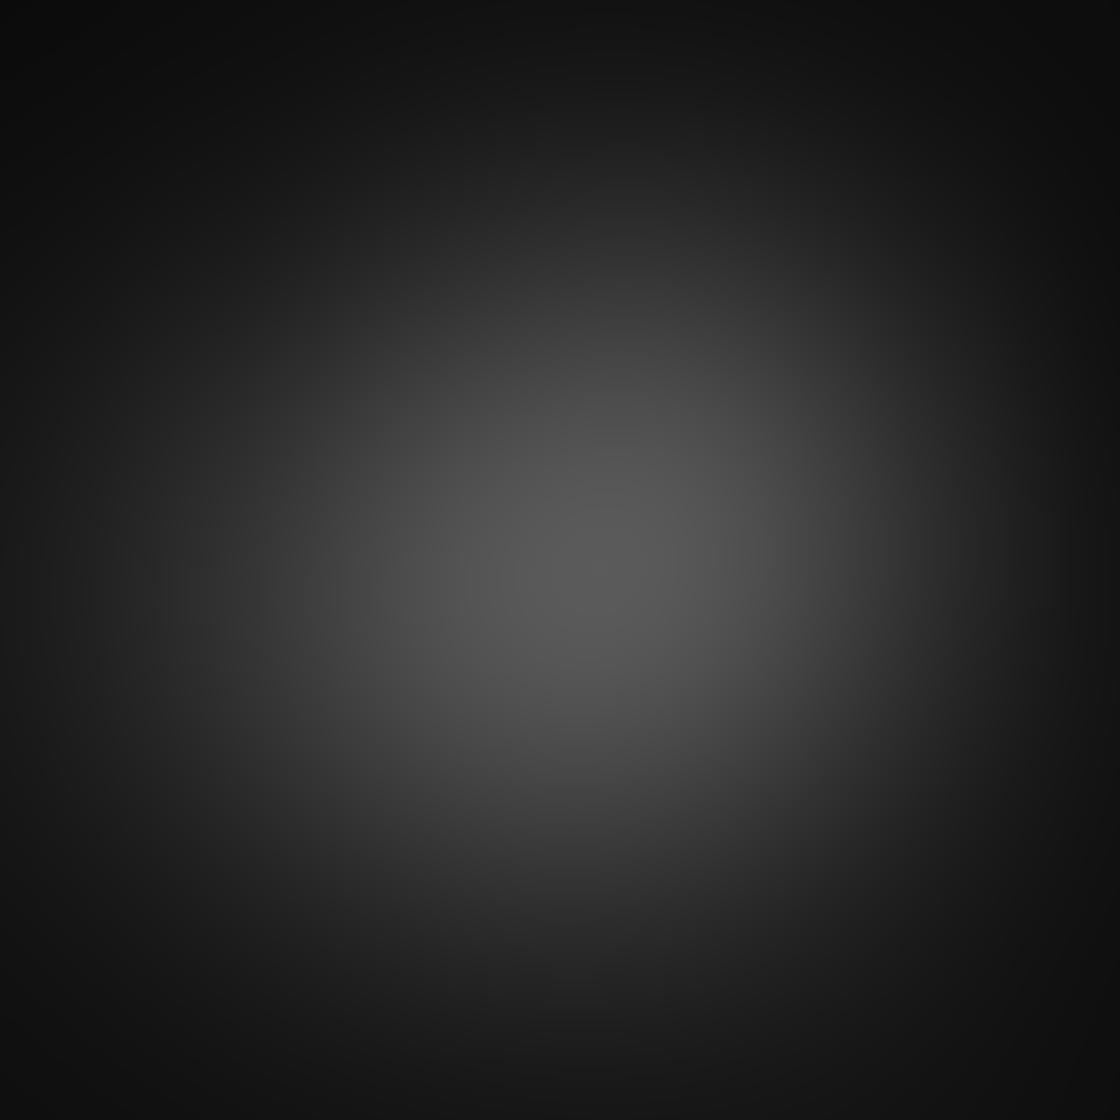 Iphone camera timer 12